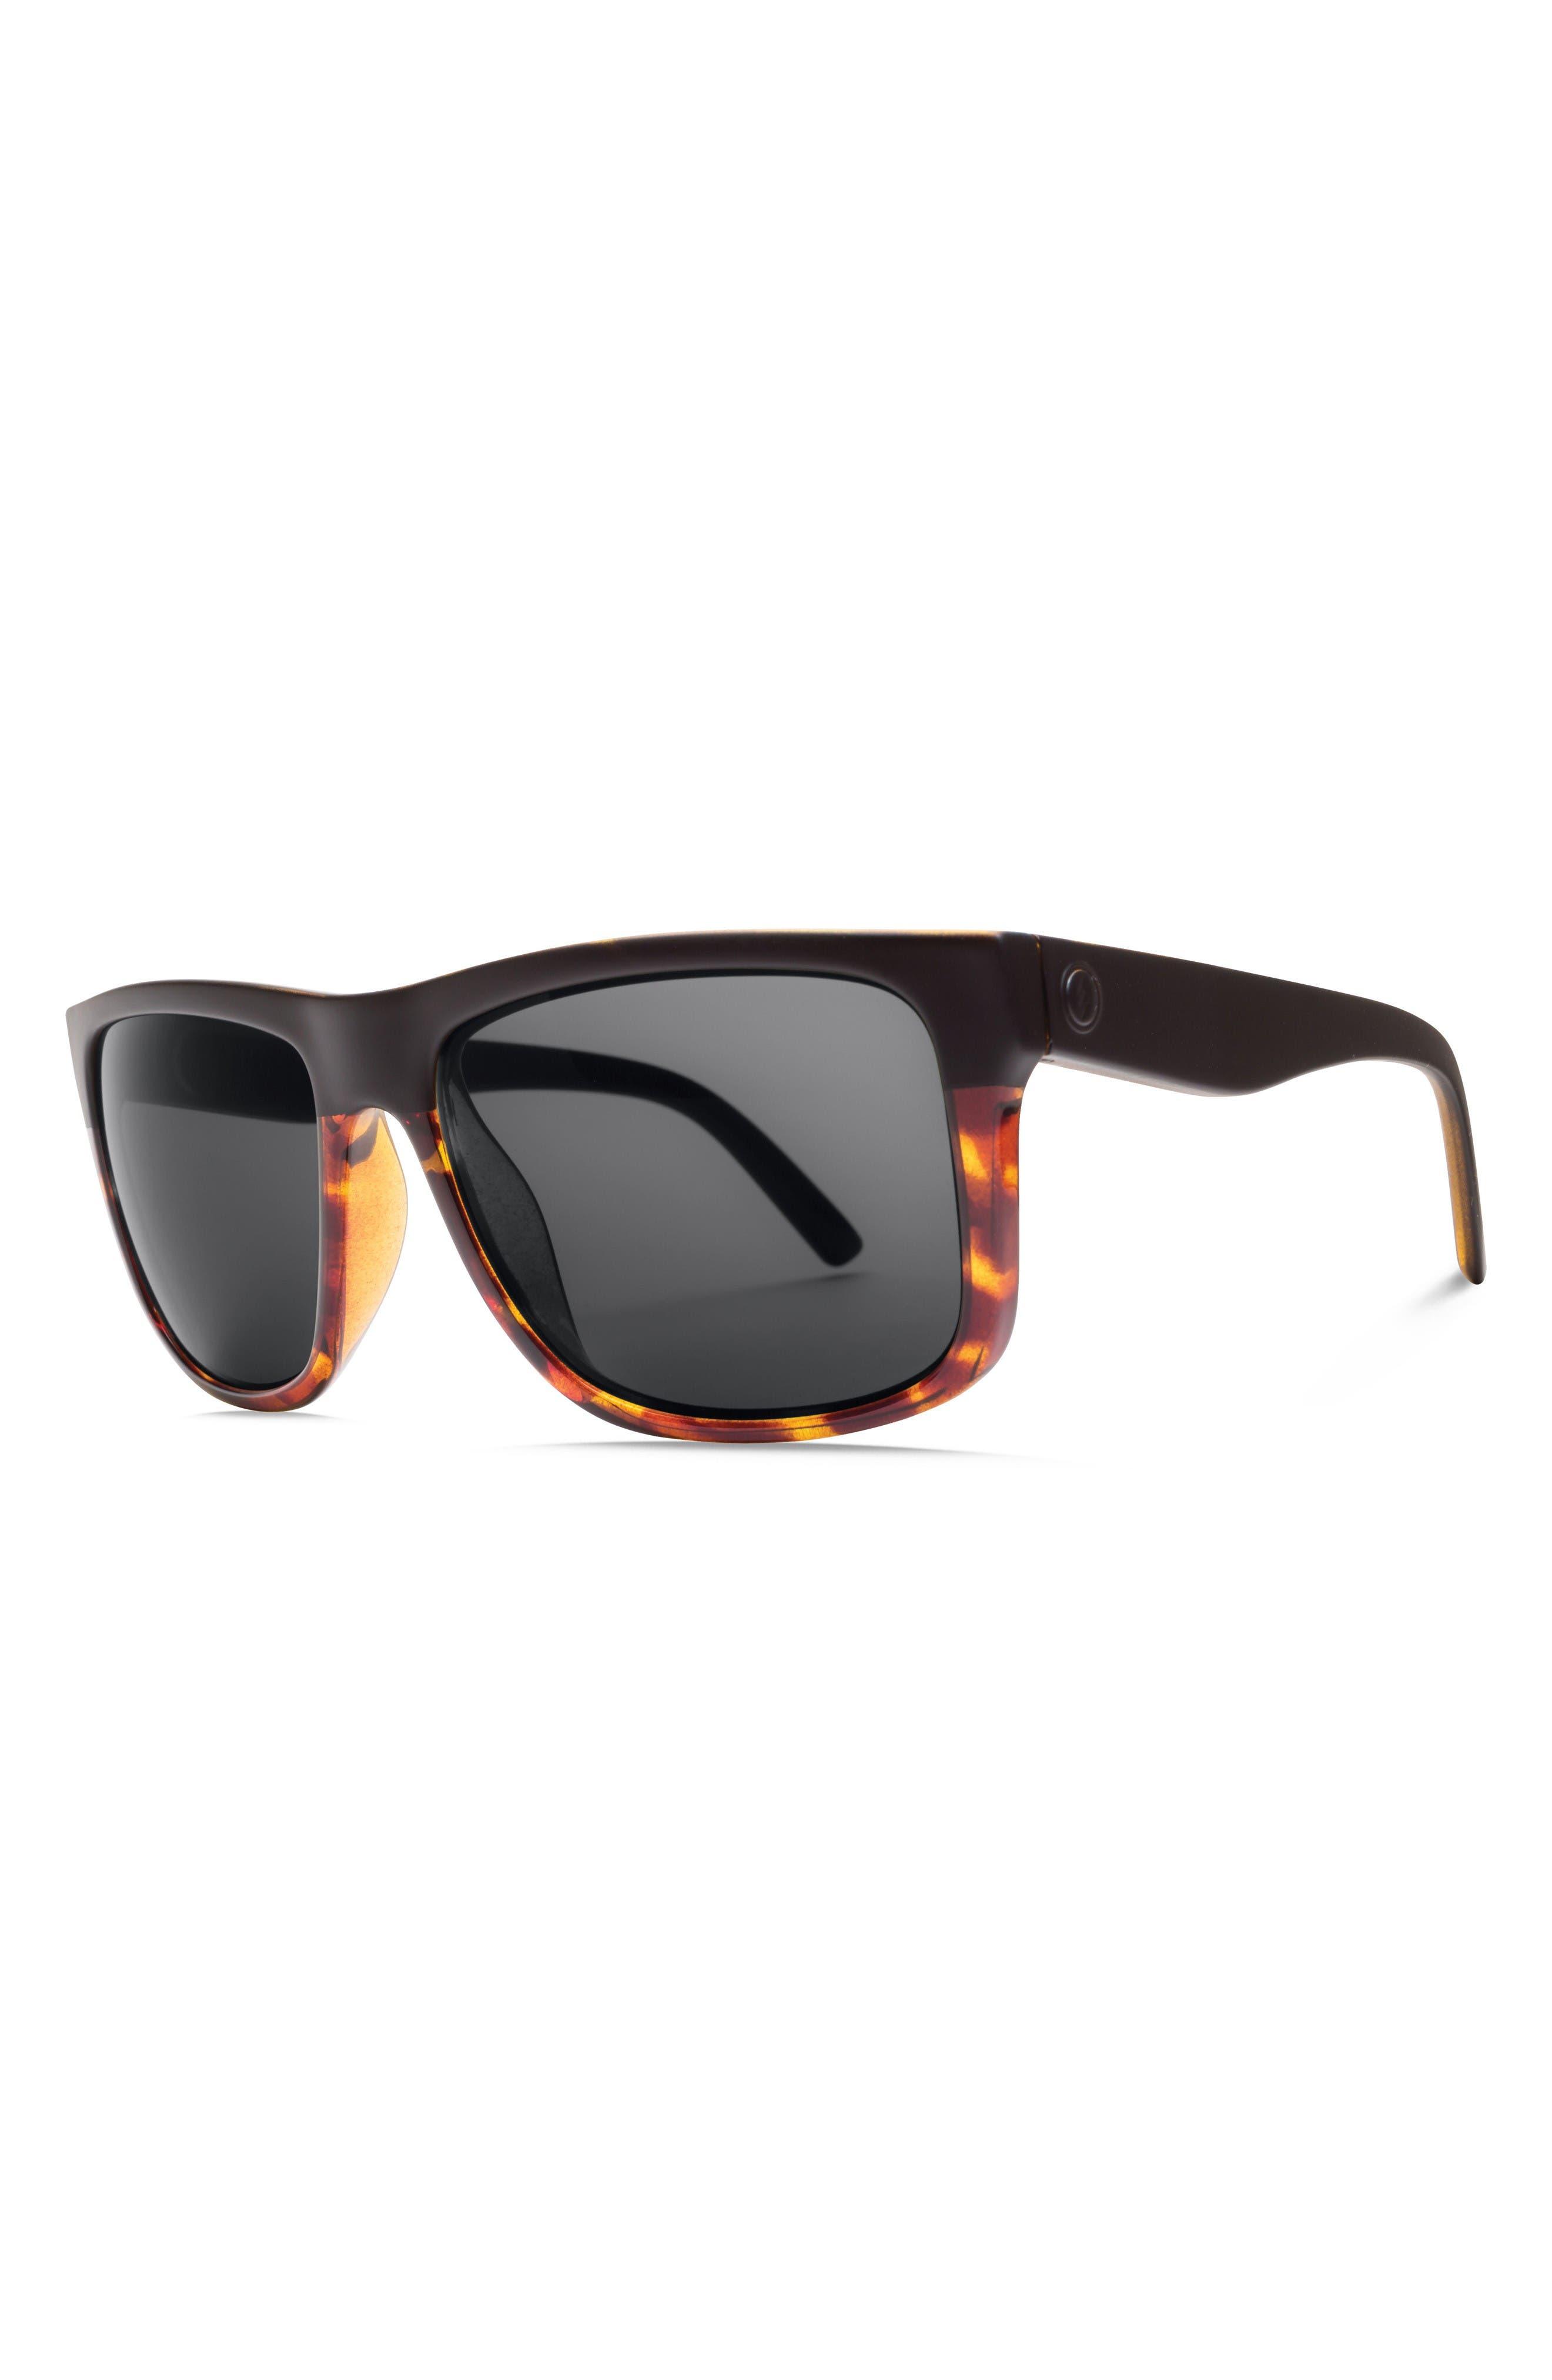 Swingarm XL 59mm Sunglasses,                             Alternate thumbnail 2, color,                             Darkside Tortoise/ Grey